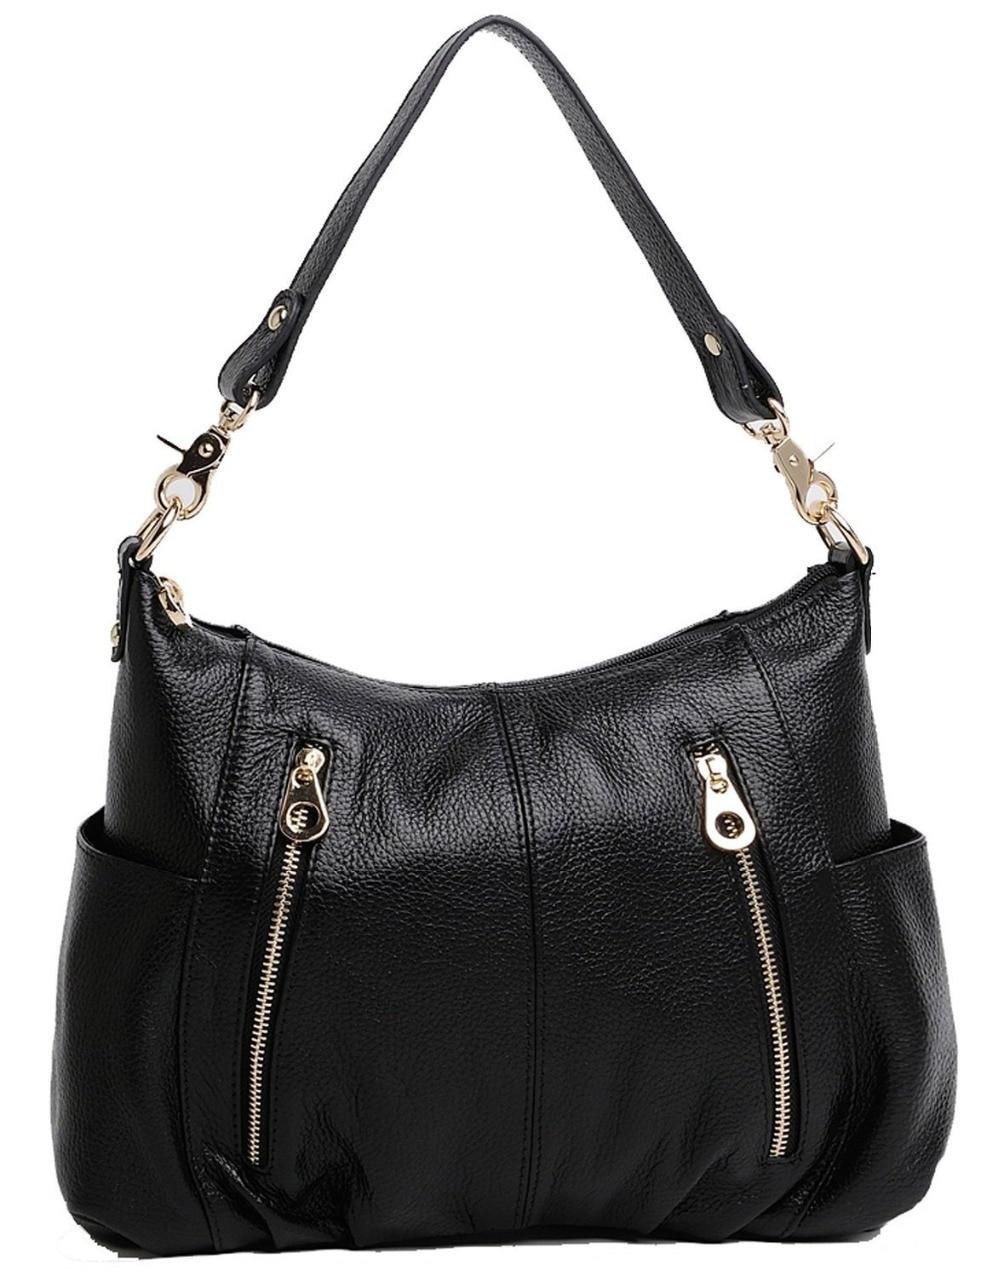 ФОТО Luxury Women Genuine Leather Casual Tote Bag Mochila Feminina Cow Handbag Shoulder Bag Solid Bigs Capacity Female Bags Female